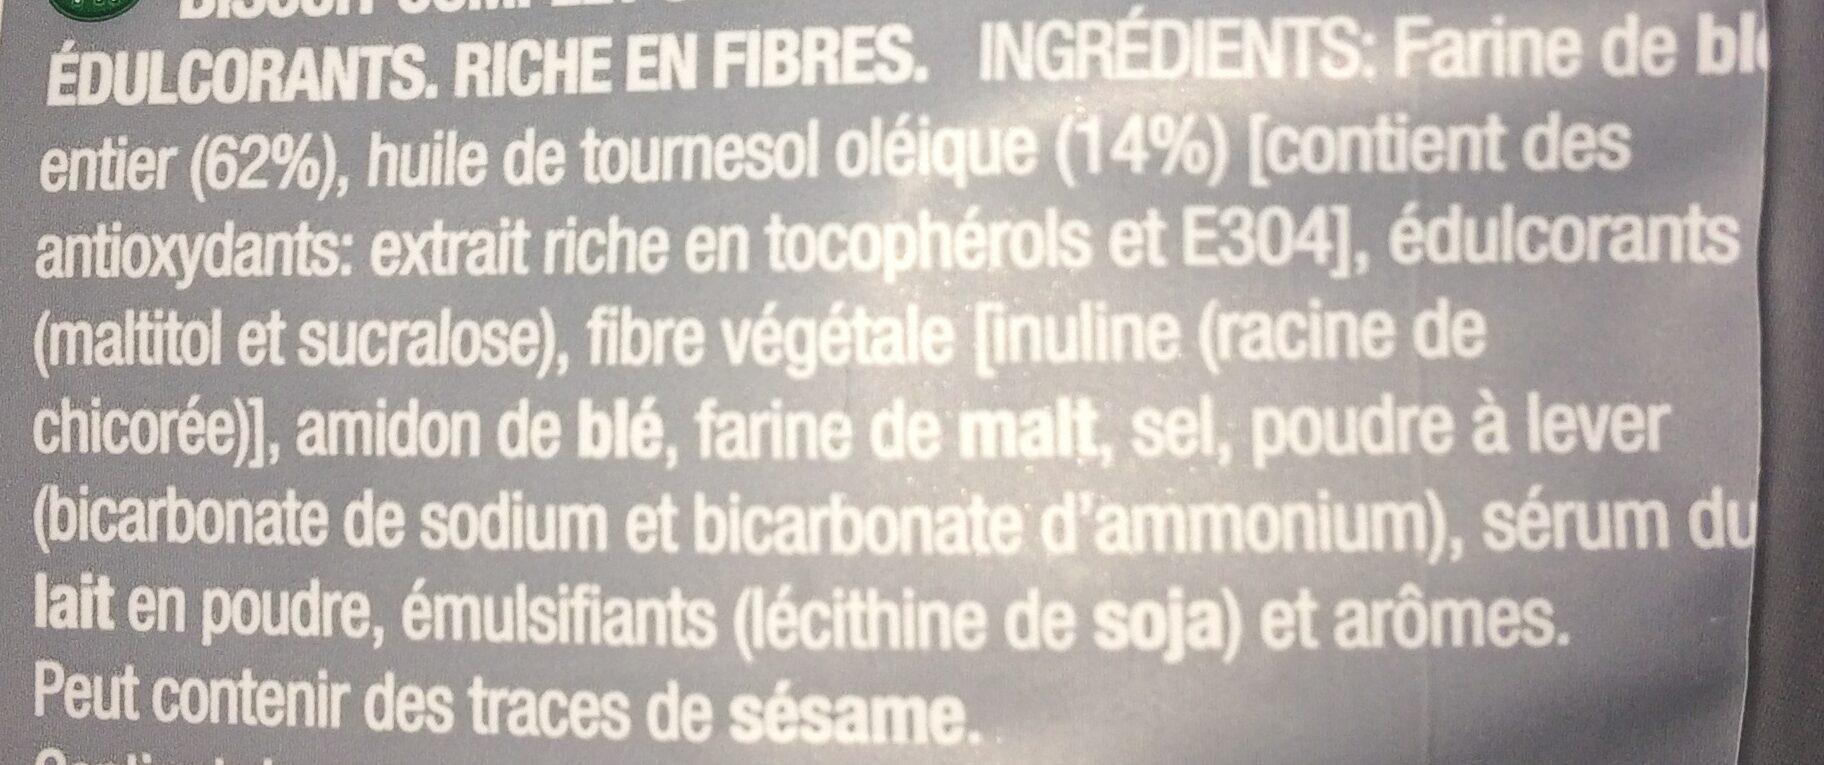 Desayuno integral - Ingrédients - fr